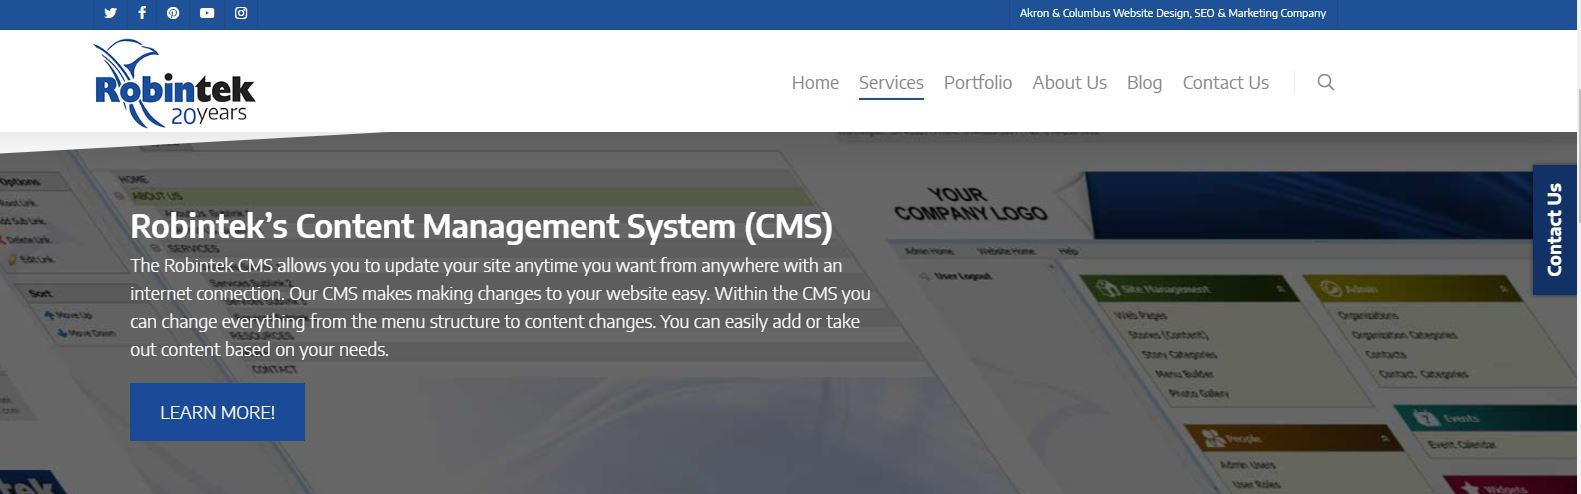 robintek content management system CMS